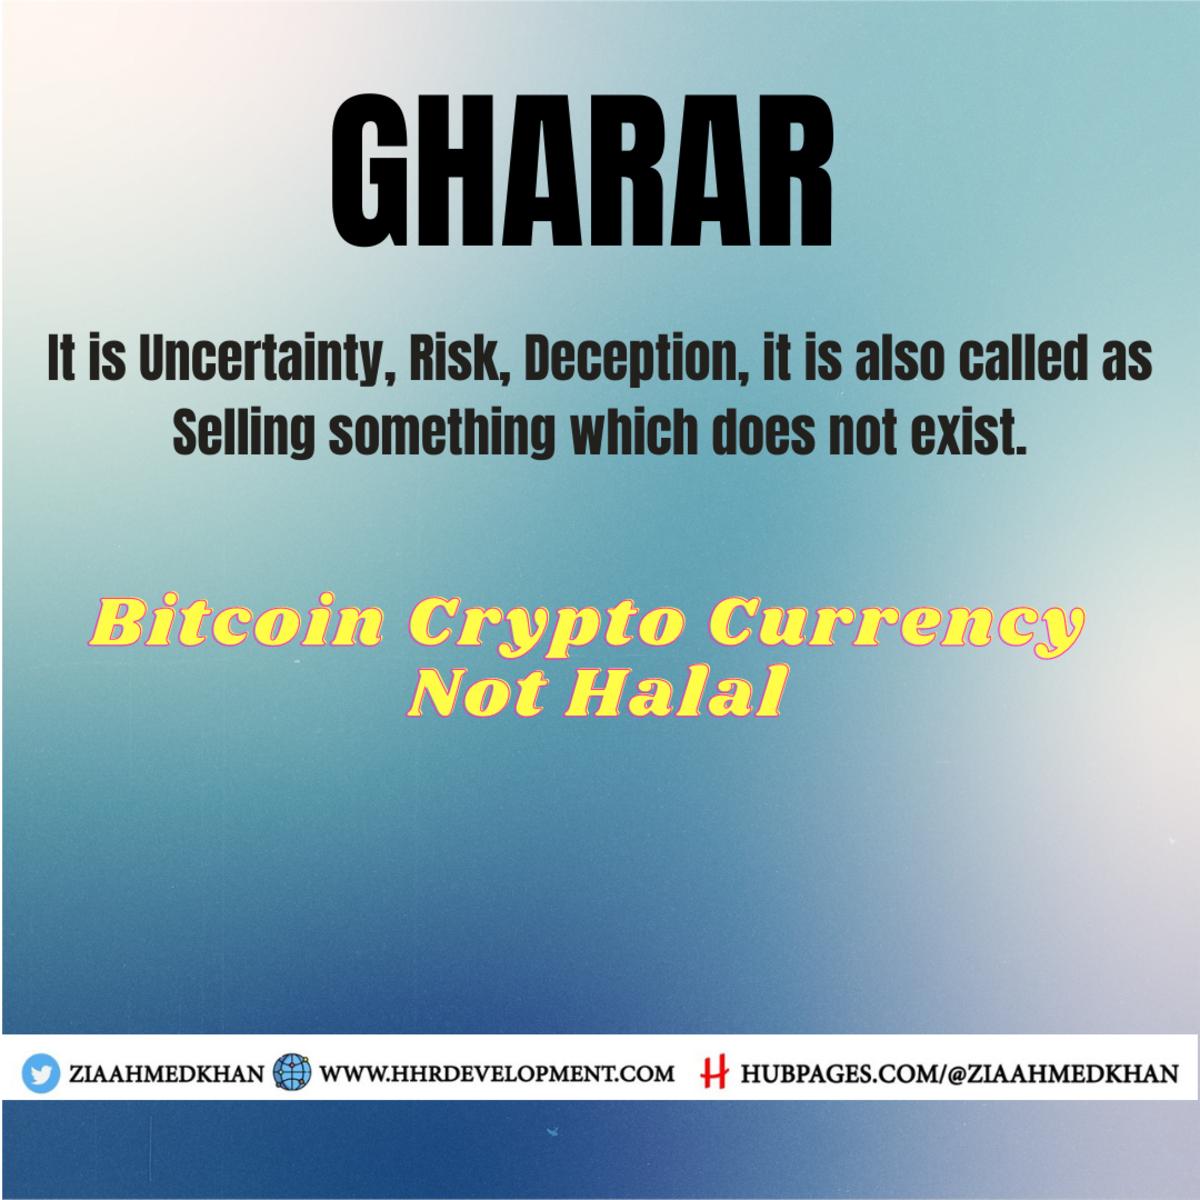 Gharar in Trading